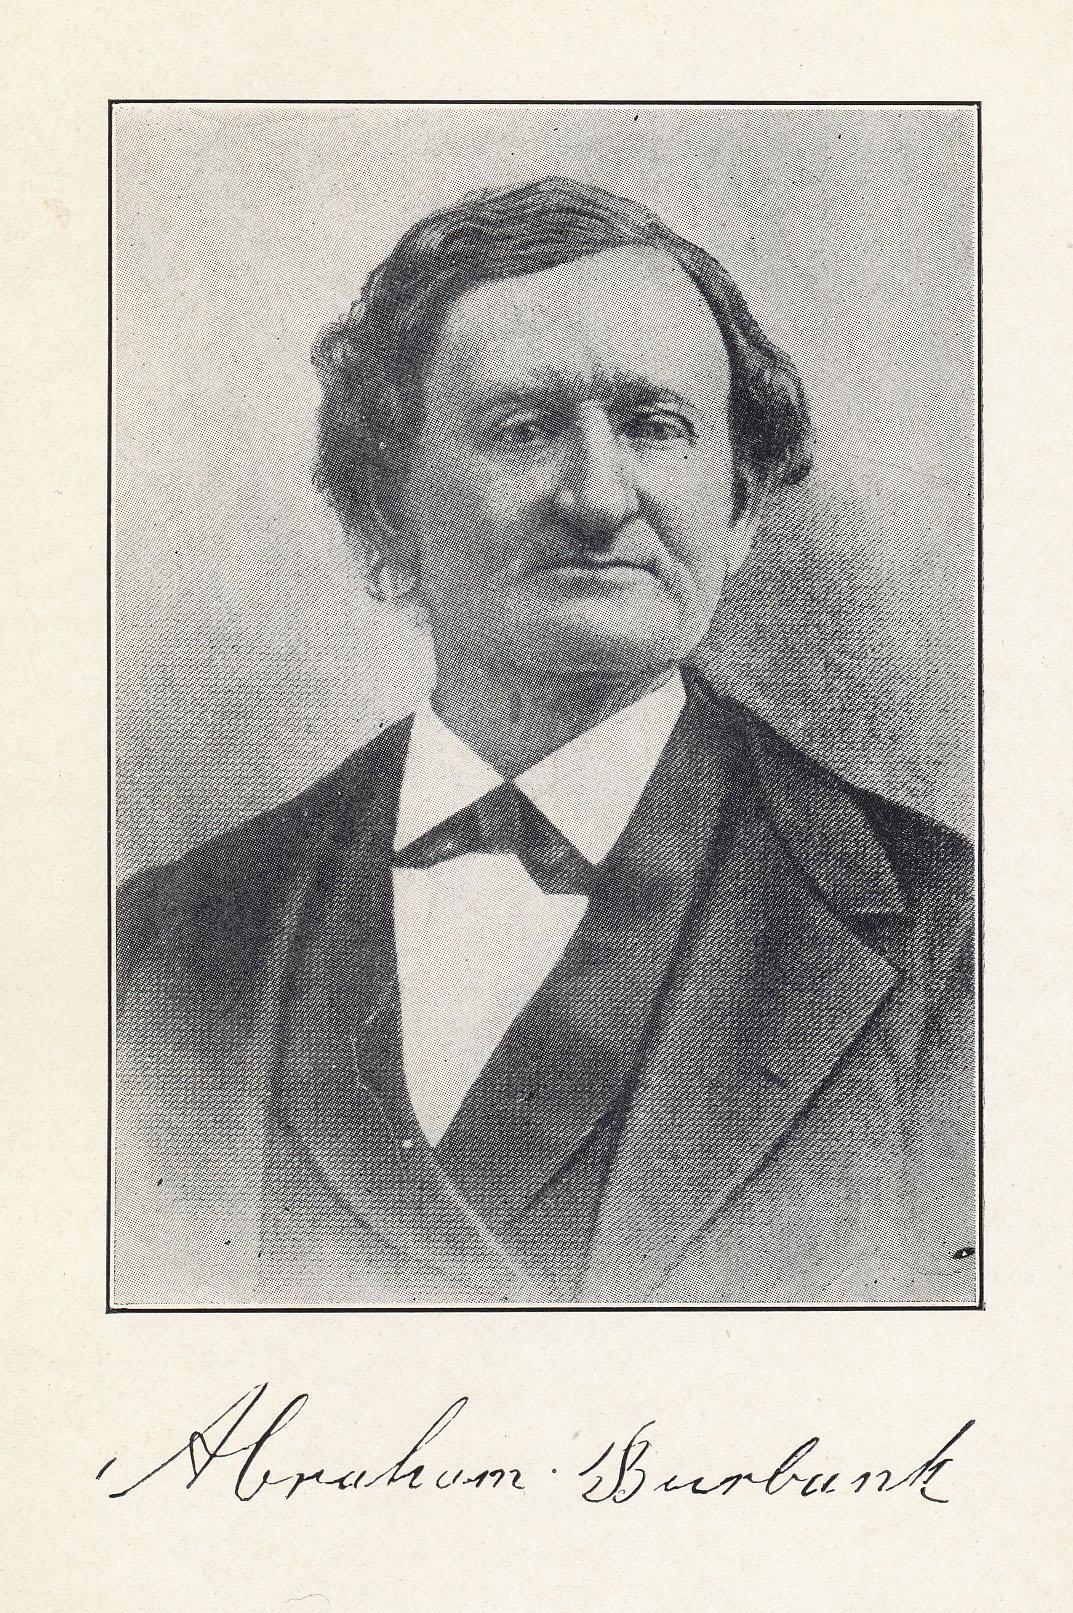 Abraham Burbank